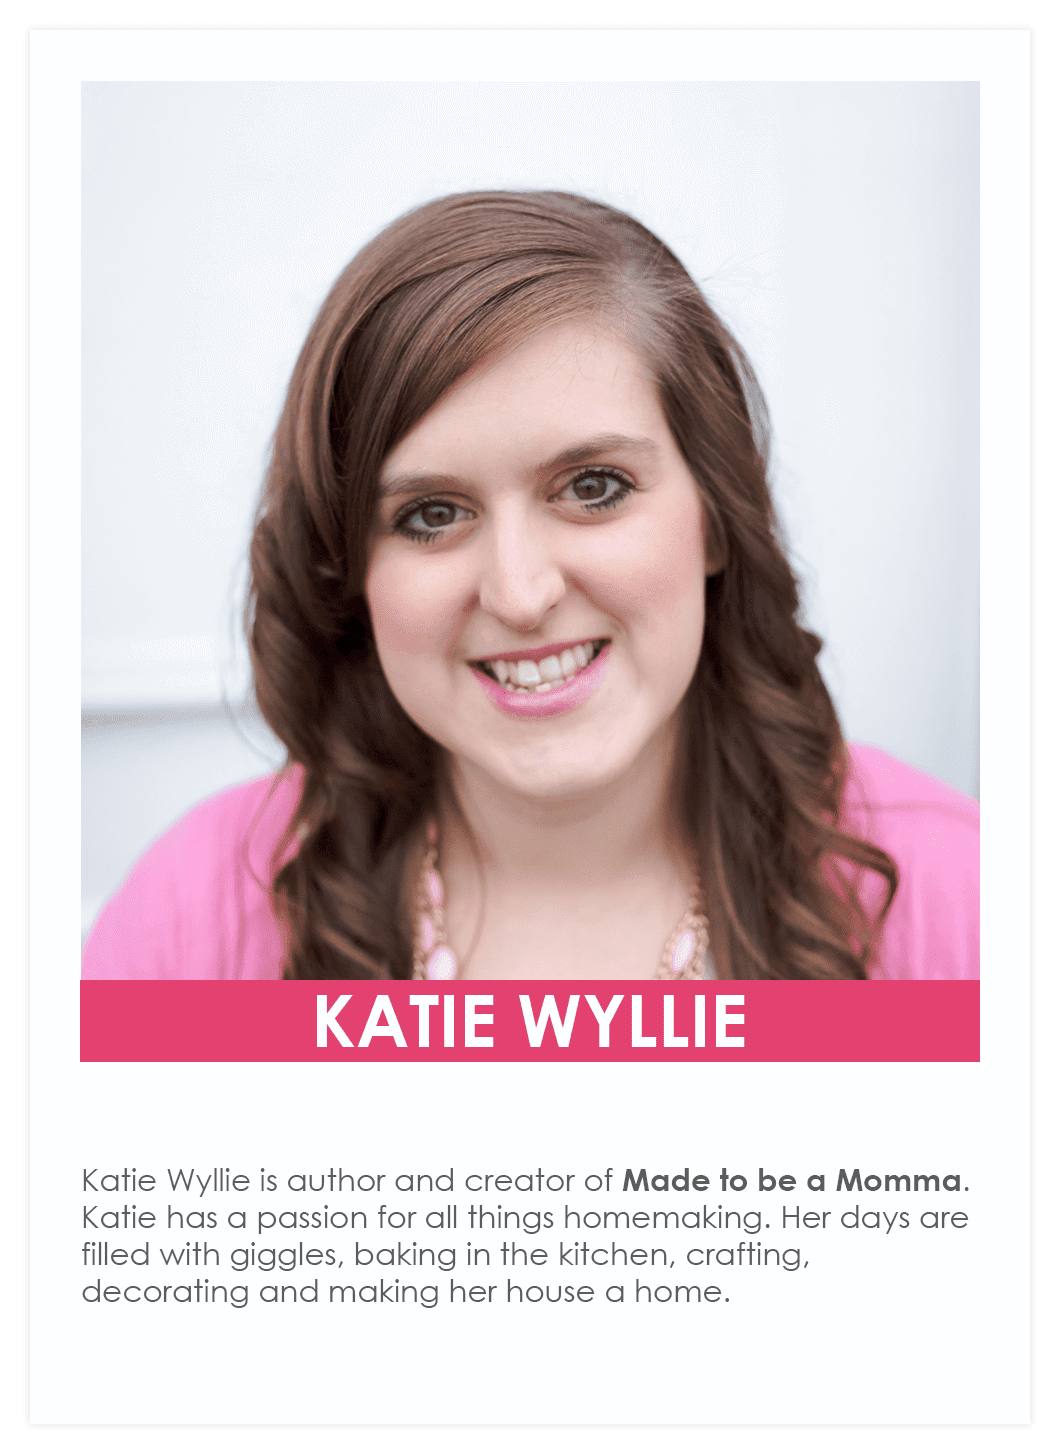 Katie Wyllie